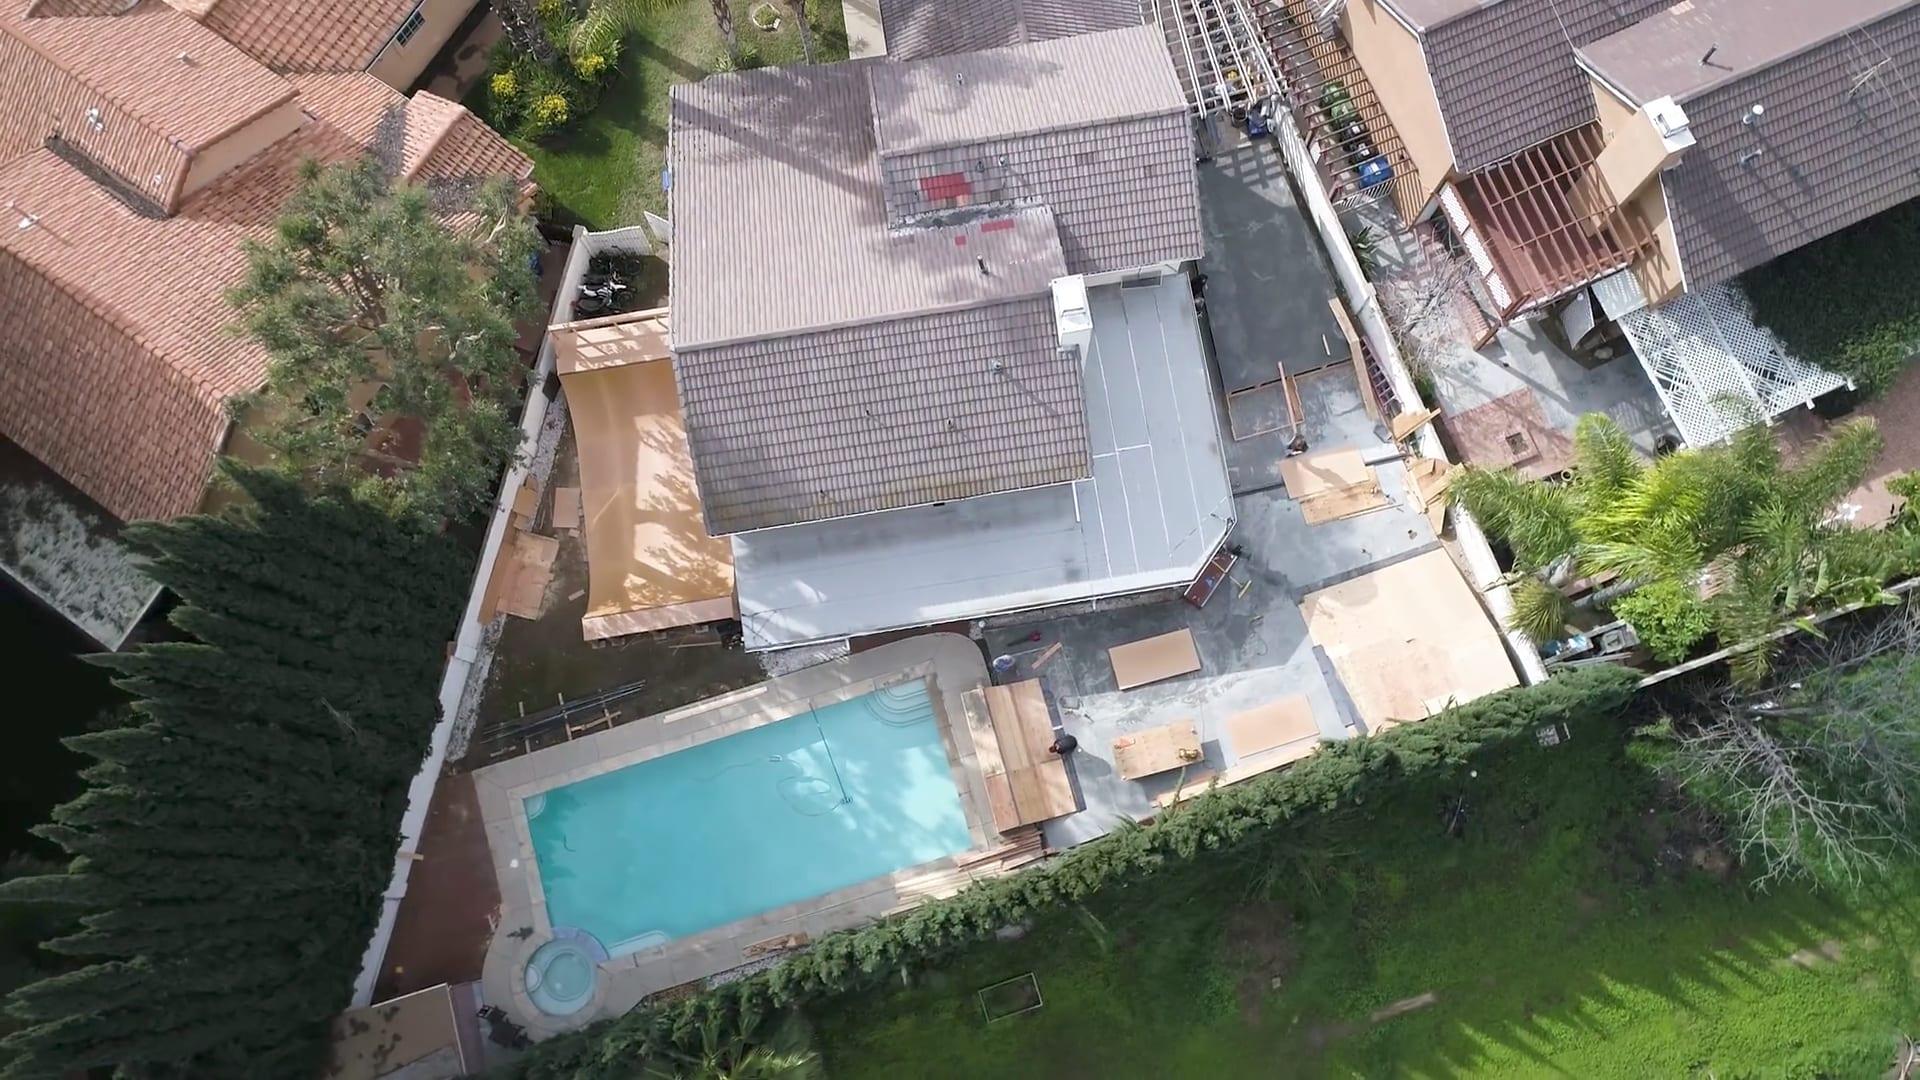 Casa em Los Angeles, California, United States